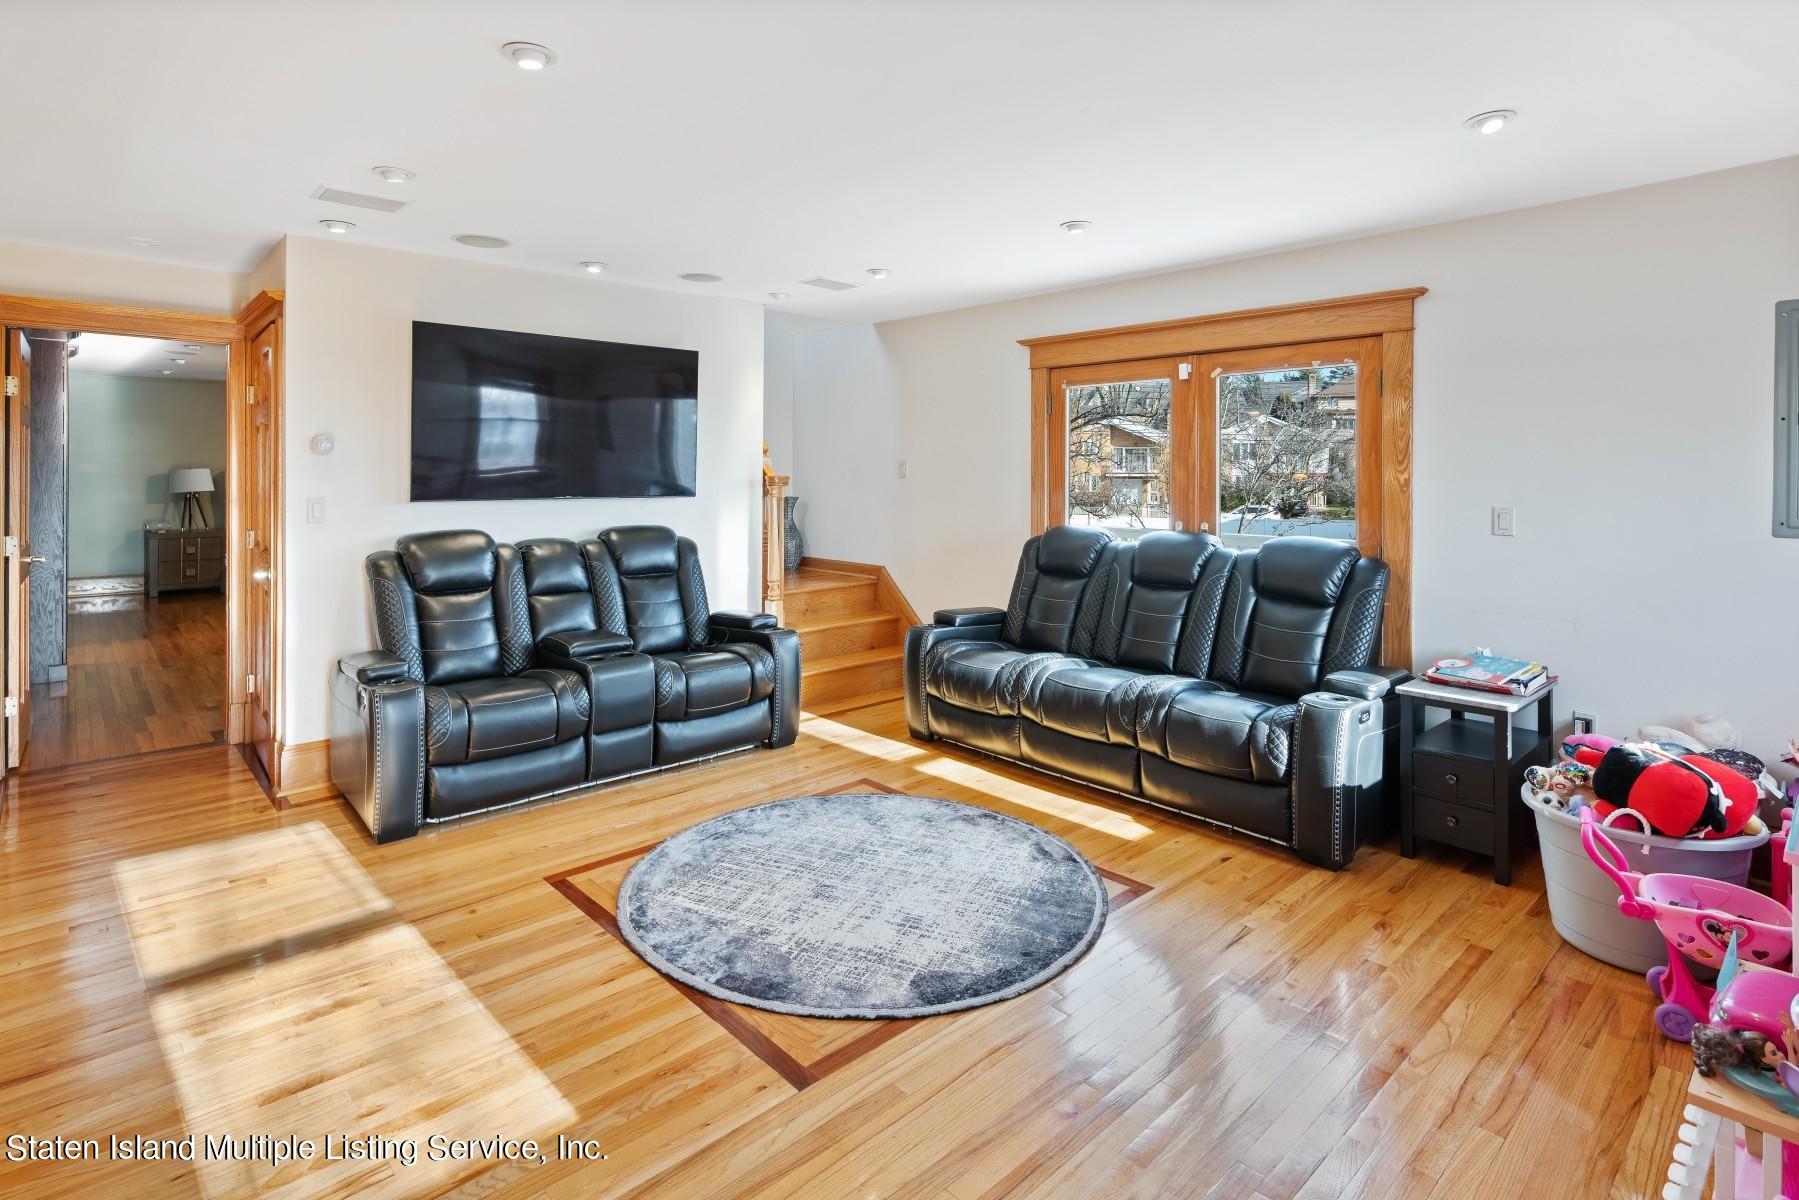 Single Family - Detached 8 Bionia Avenue  Staten Island, NY 10305, MLS-1142818-11